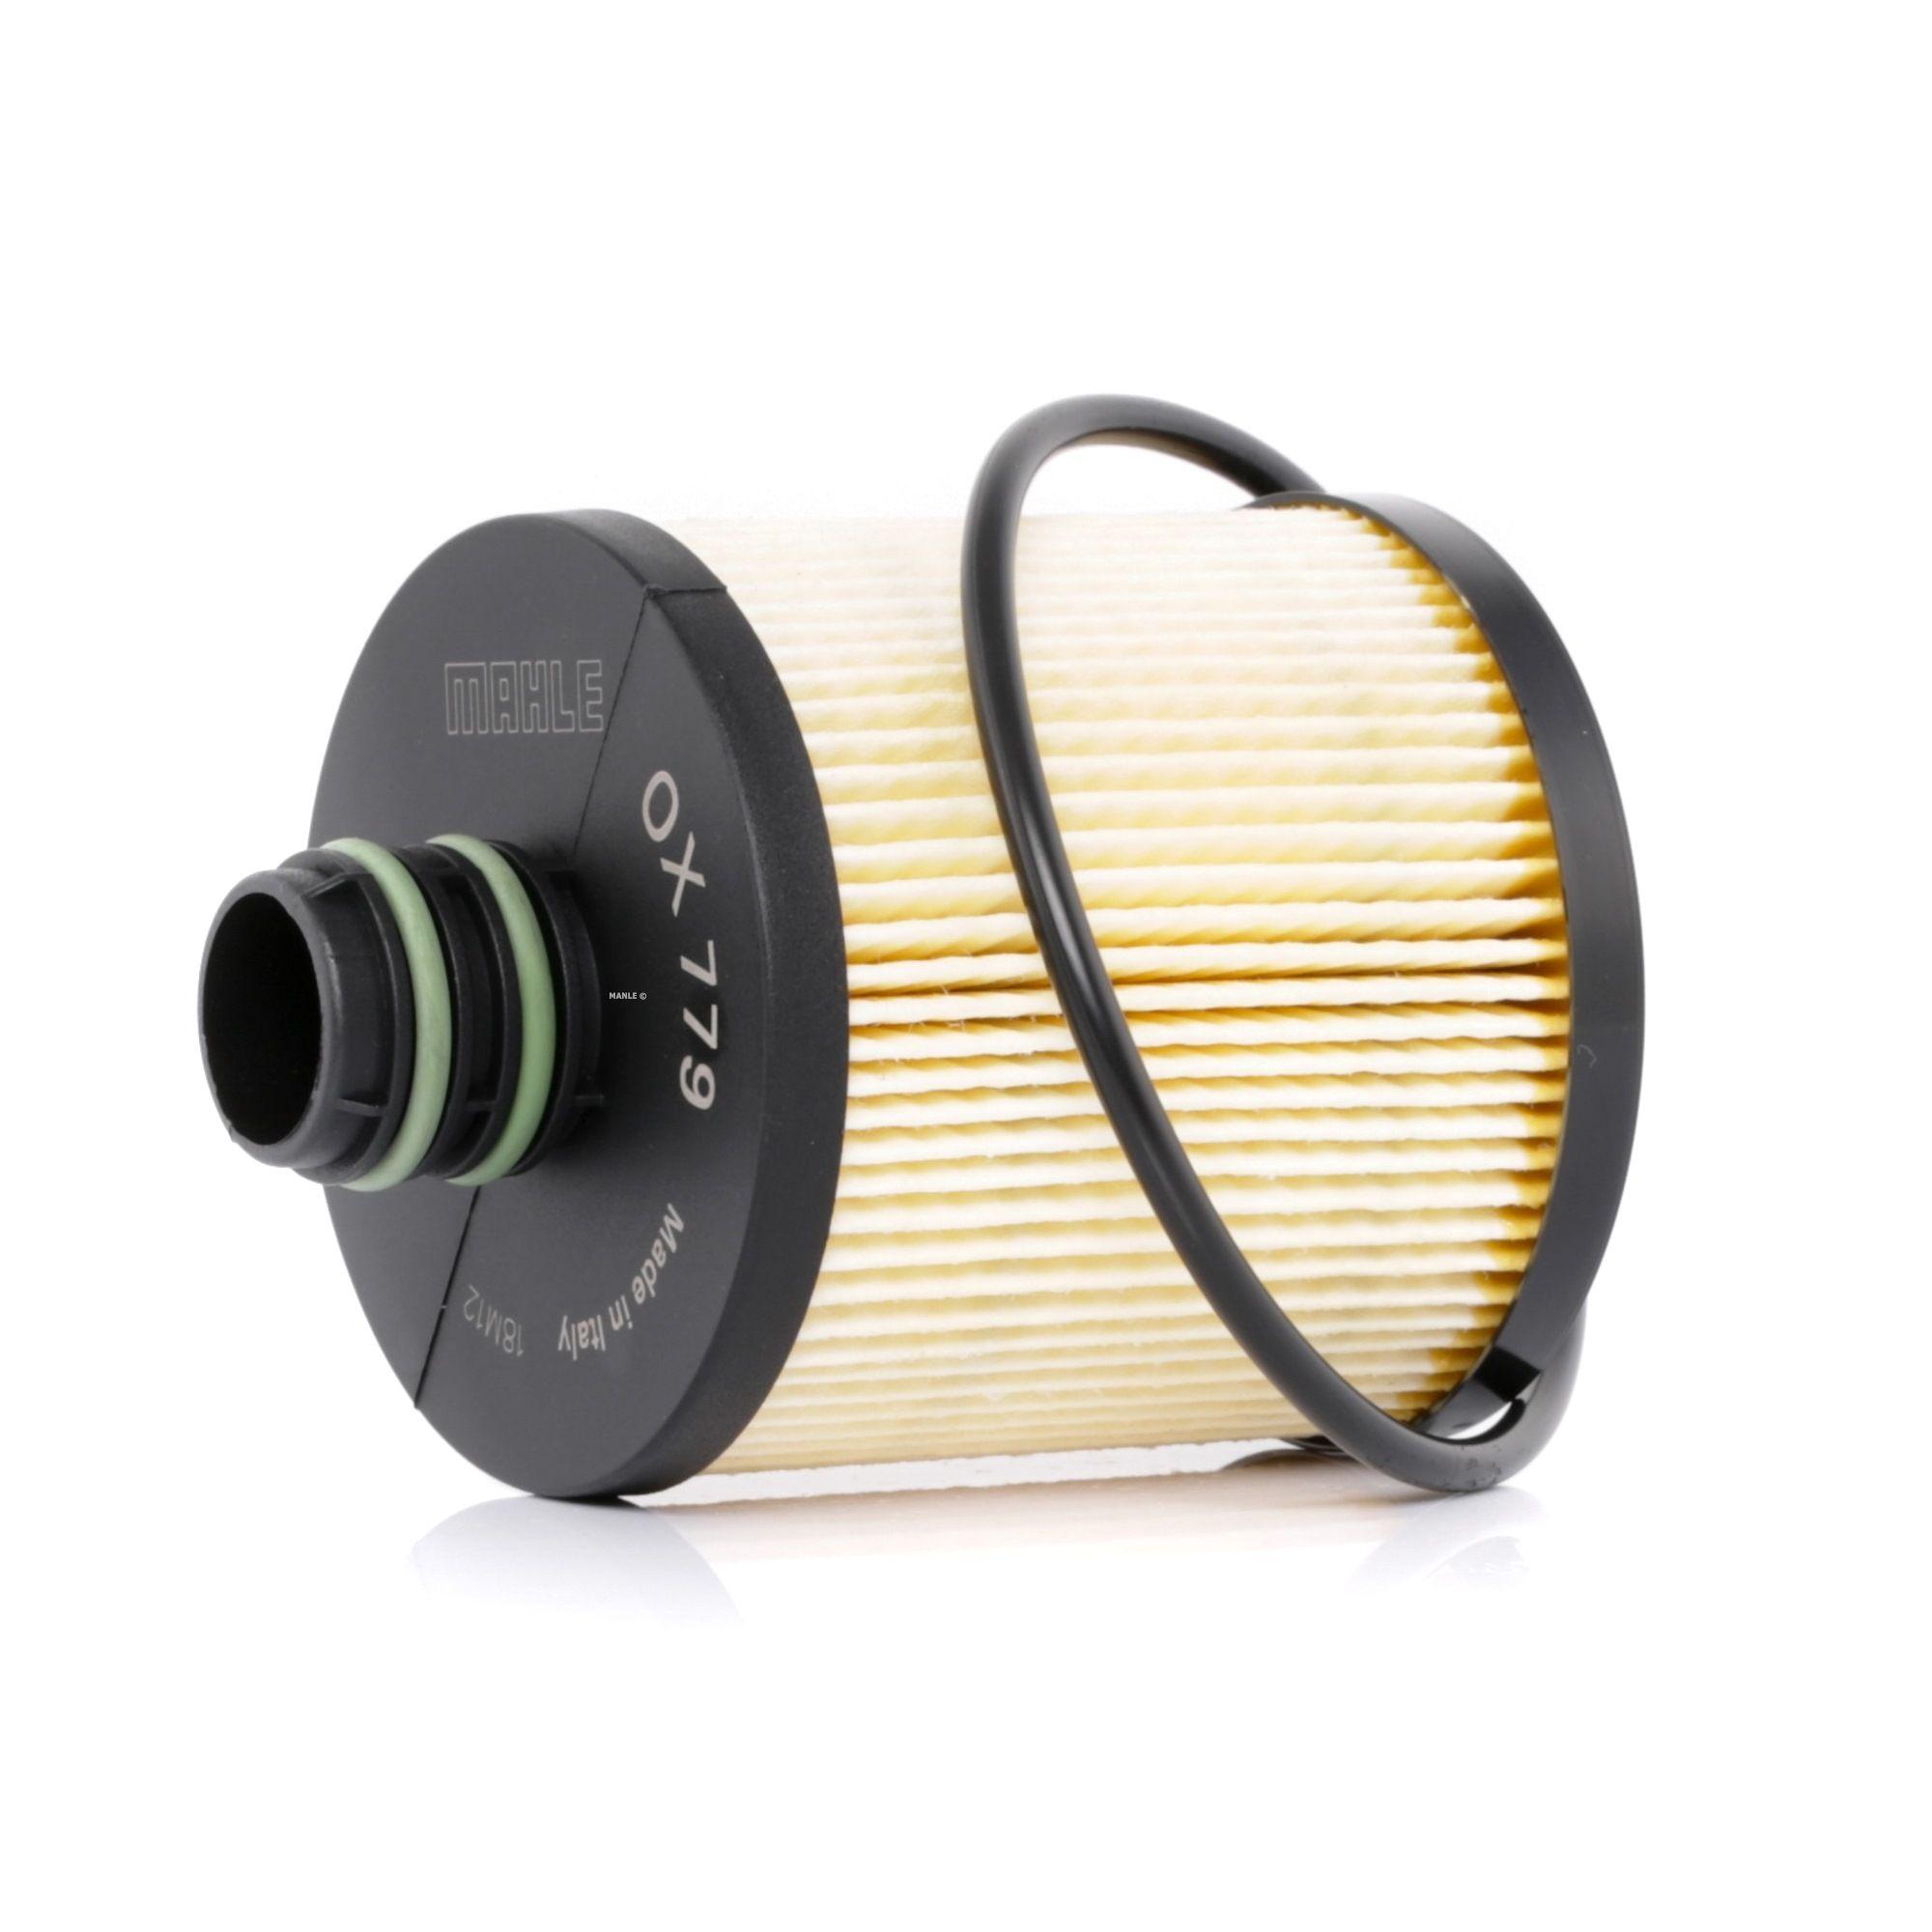 OX779DECO MAHLE ORIGINAL Filtereinsatz Ø: 72,1mm, Ø: 72,1mm, Höhe: 101mm, Höhe 1: 74mm Ölfilter OX 779D günstig kaufen